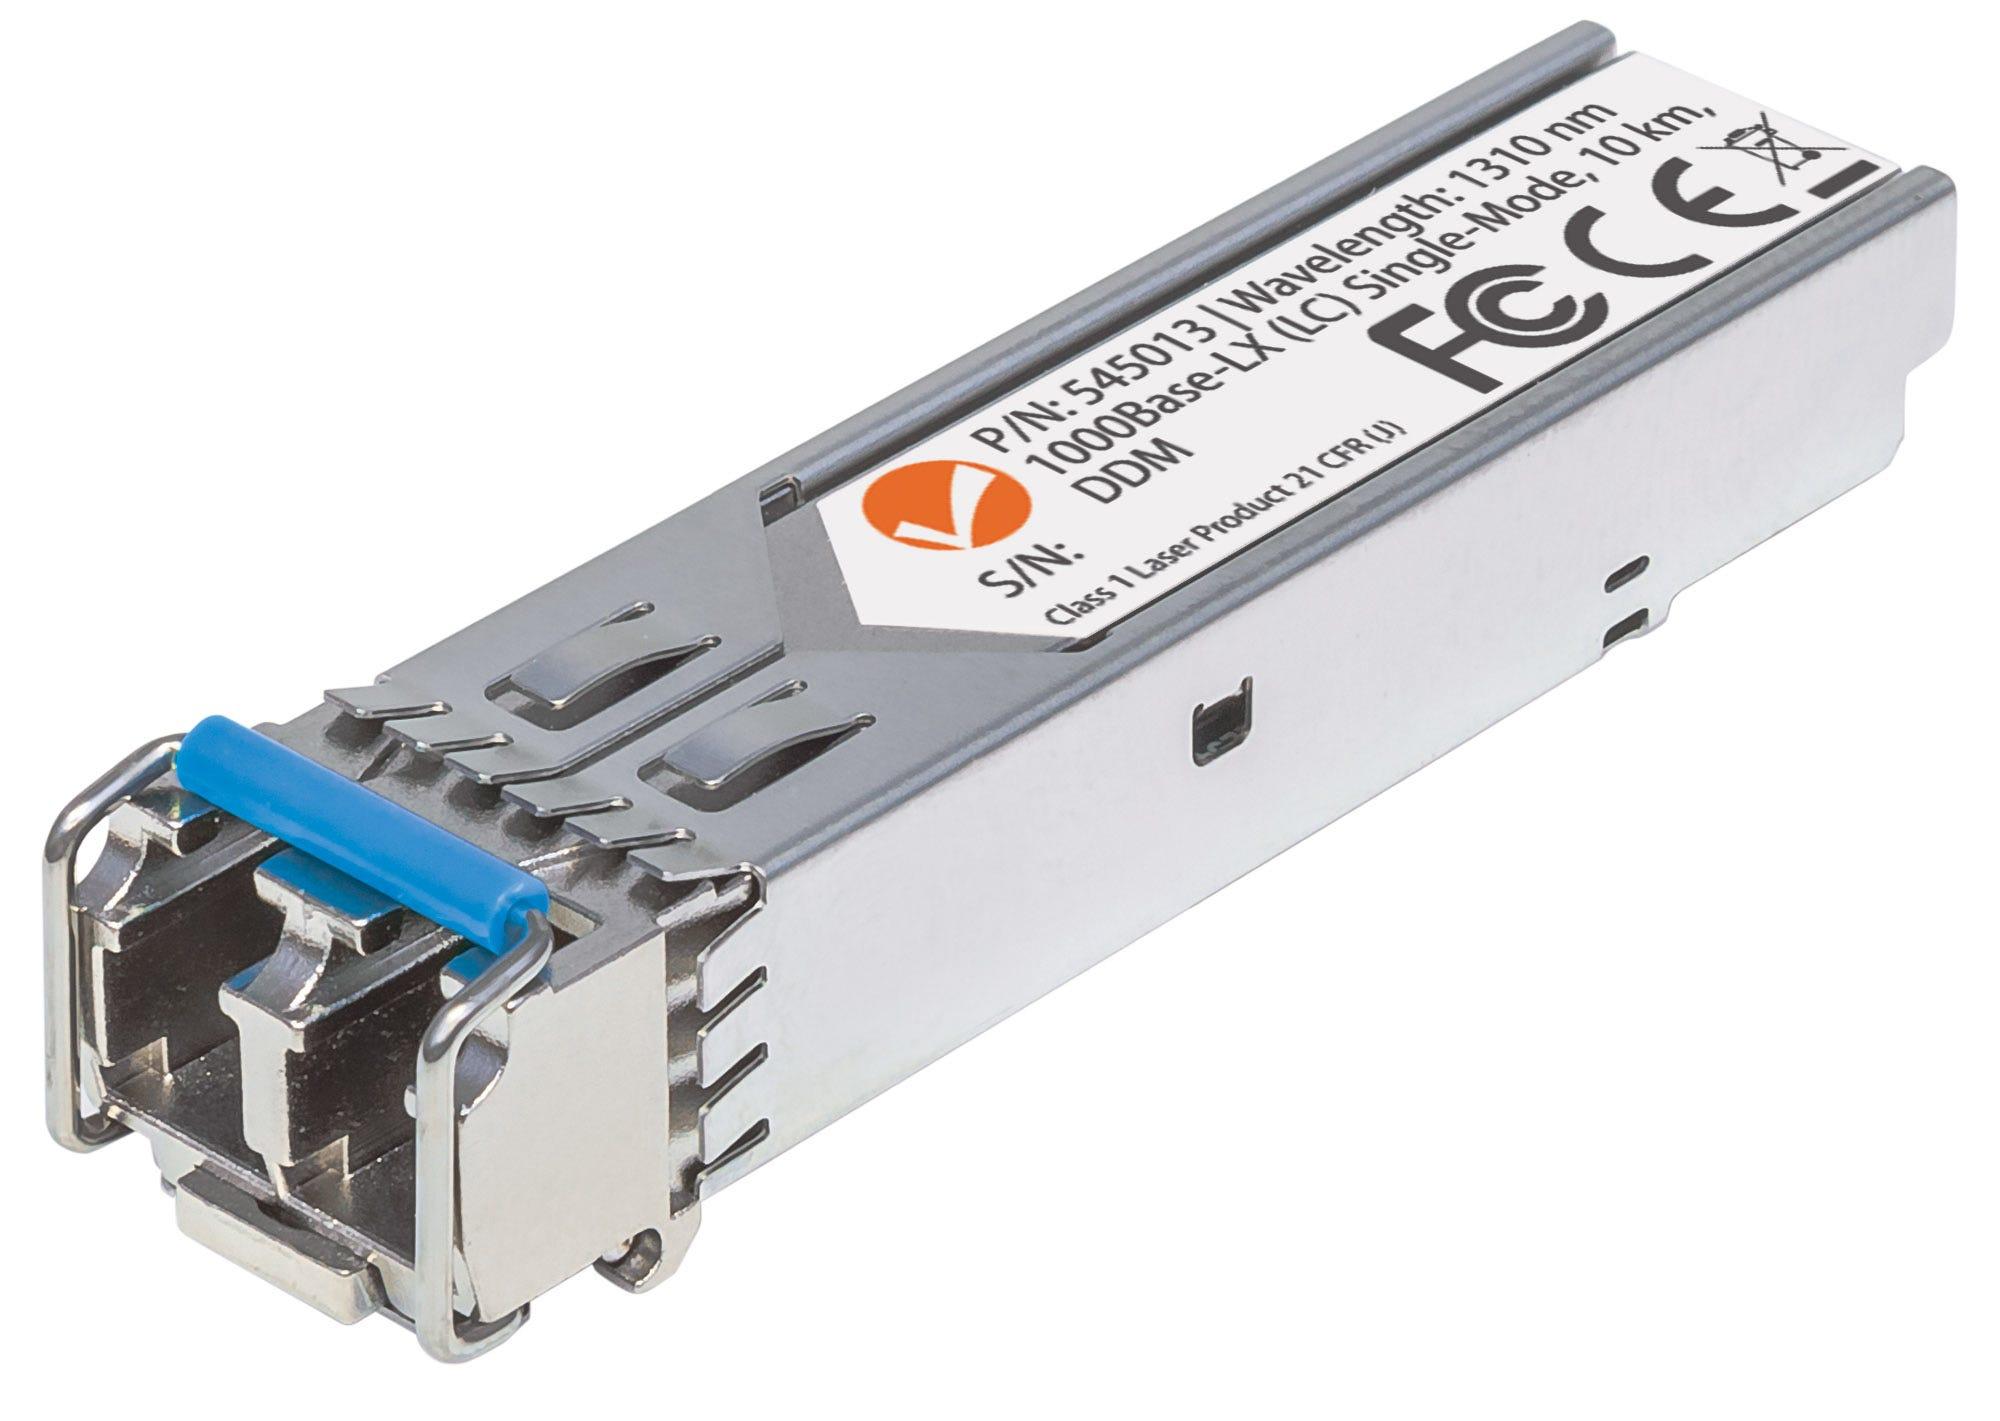 Intellinet Gigabit Fibre SFP Optical Transceiver Module, 1000Base-Lx (LC) Single-Mode Port, 10km